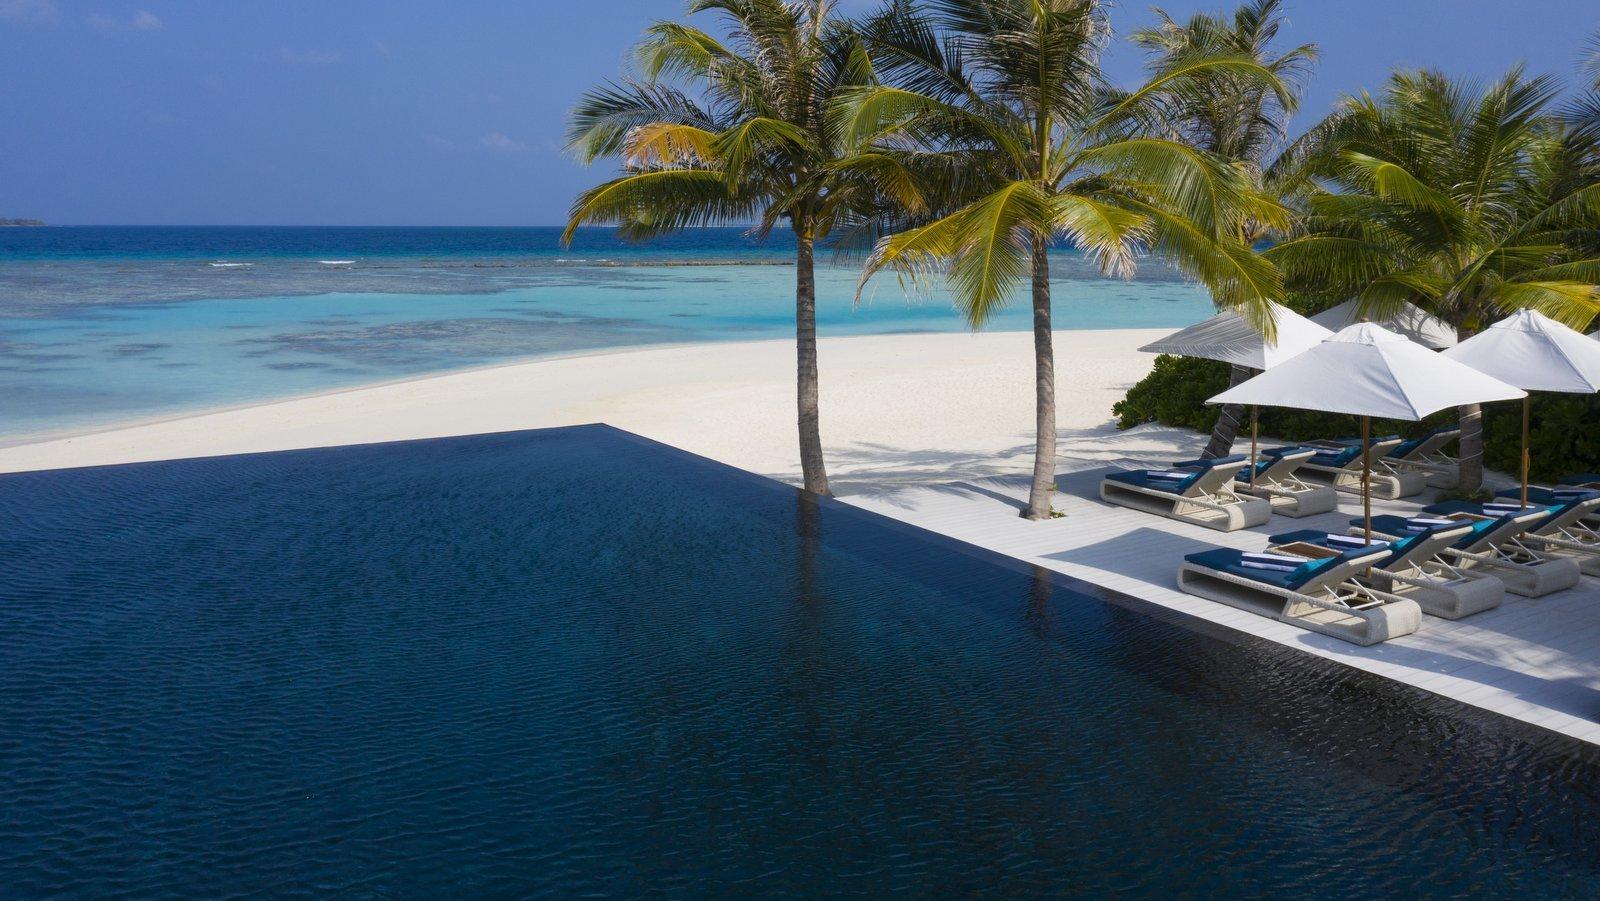 Мальдивы, отель Movenpick Resort Kuredhivaru Maldives, бассейн